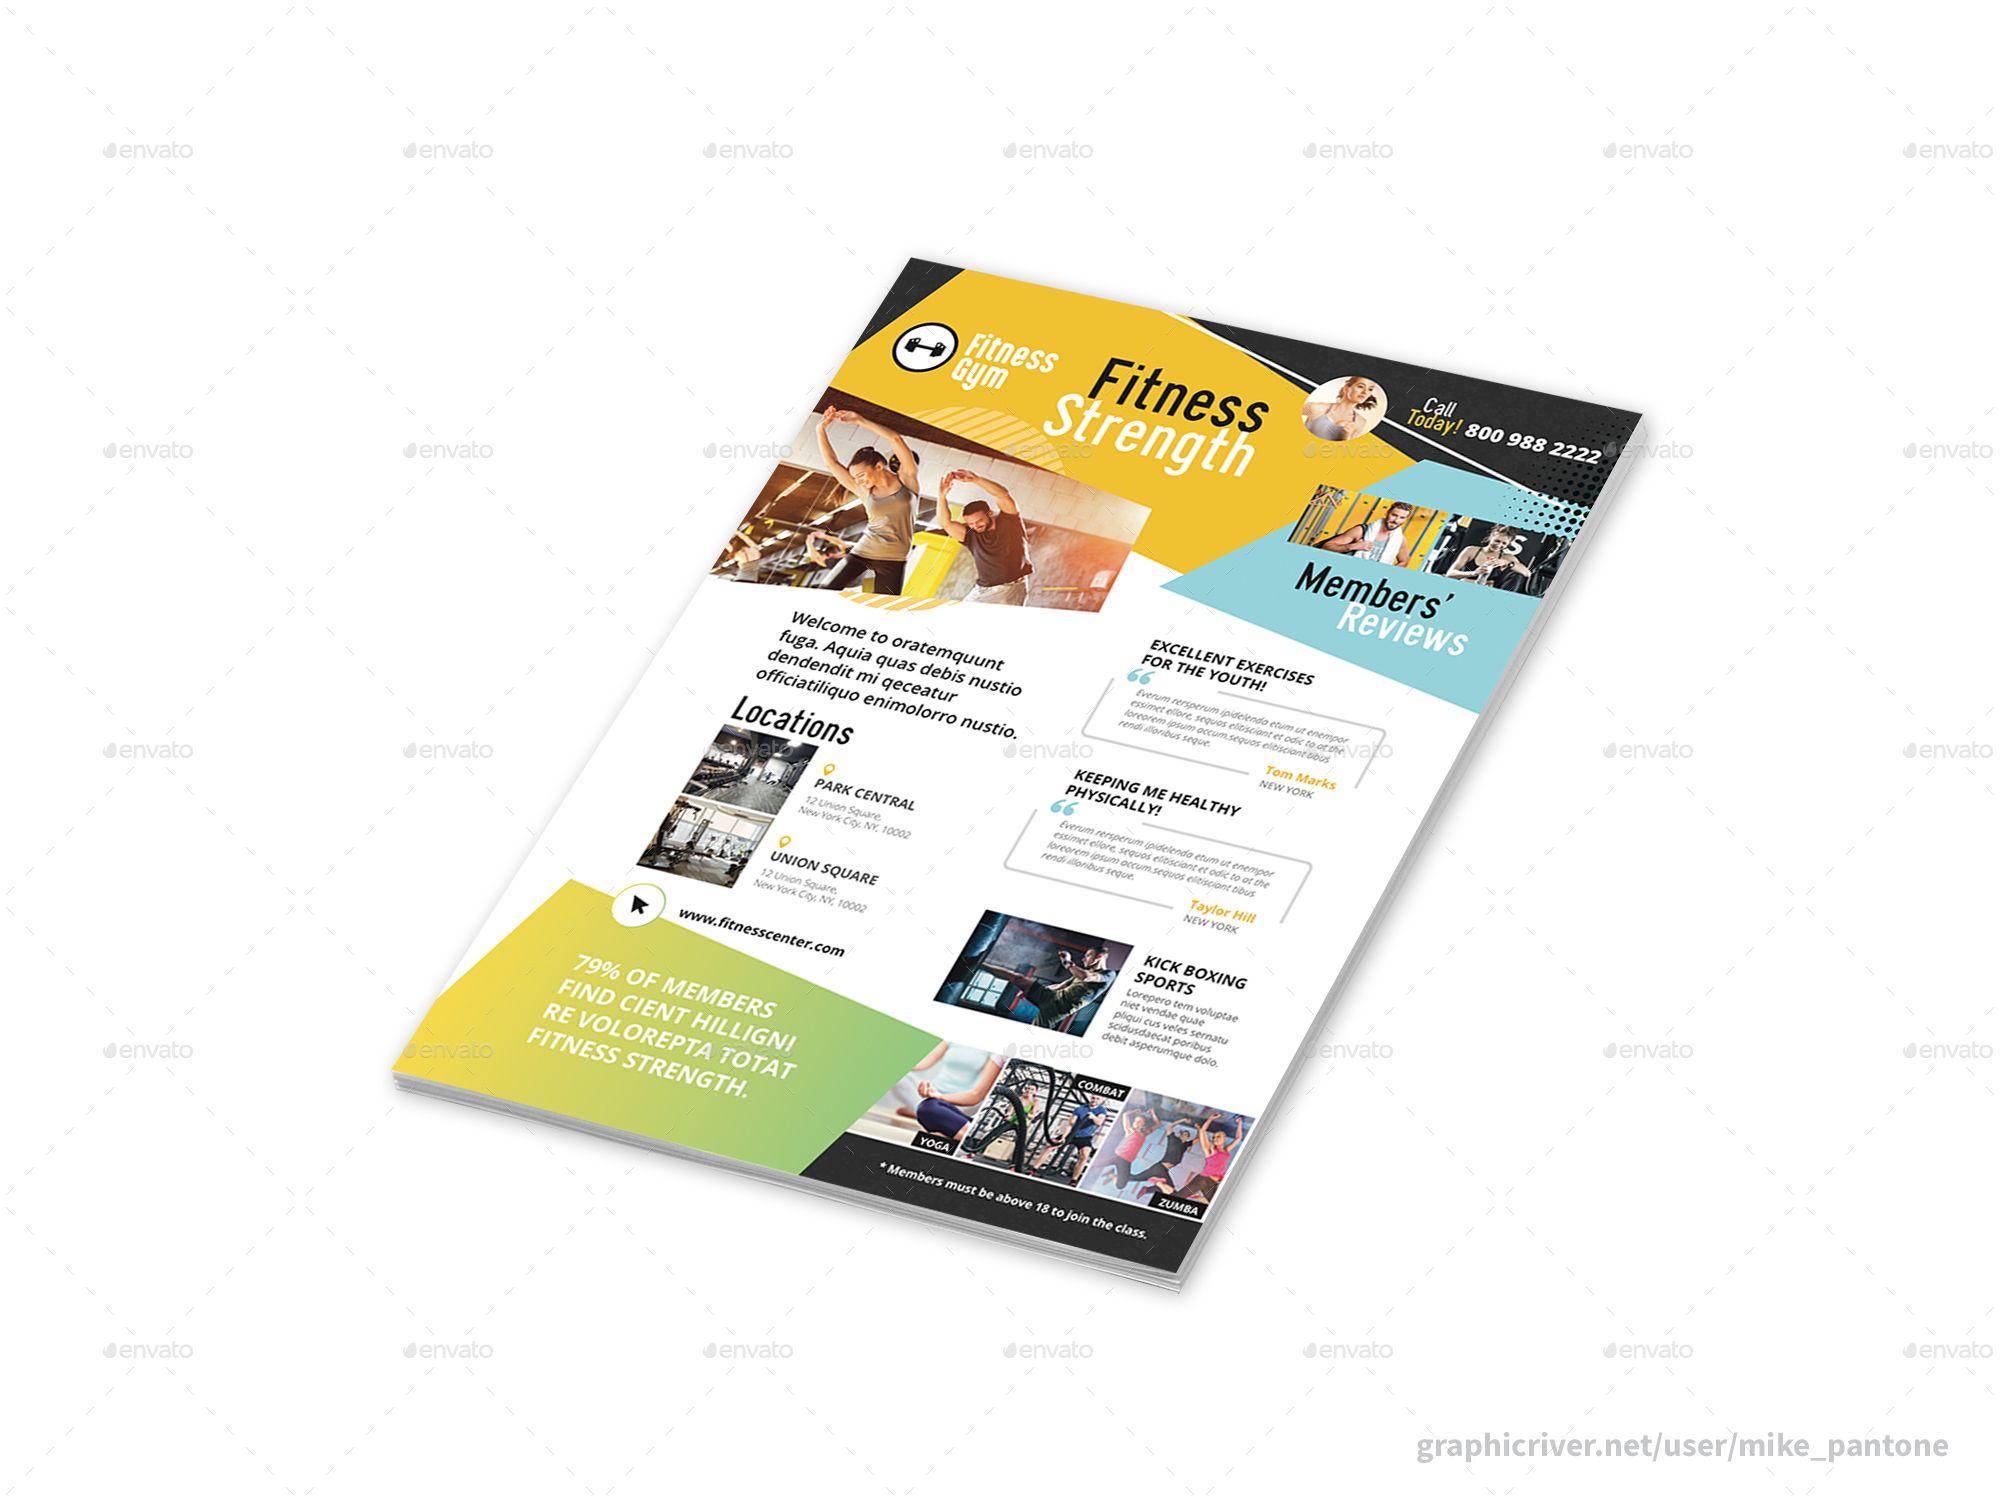 Fitness Club Print Bundle #Affiliate #Club, #Aff, #Fitness, #Bundle, #Print